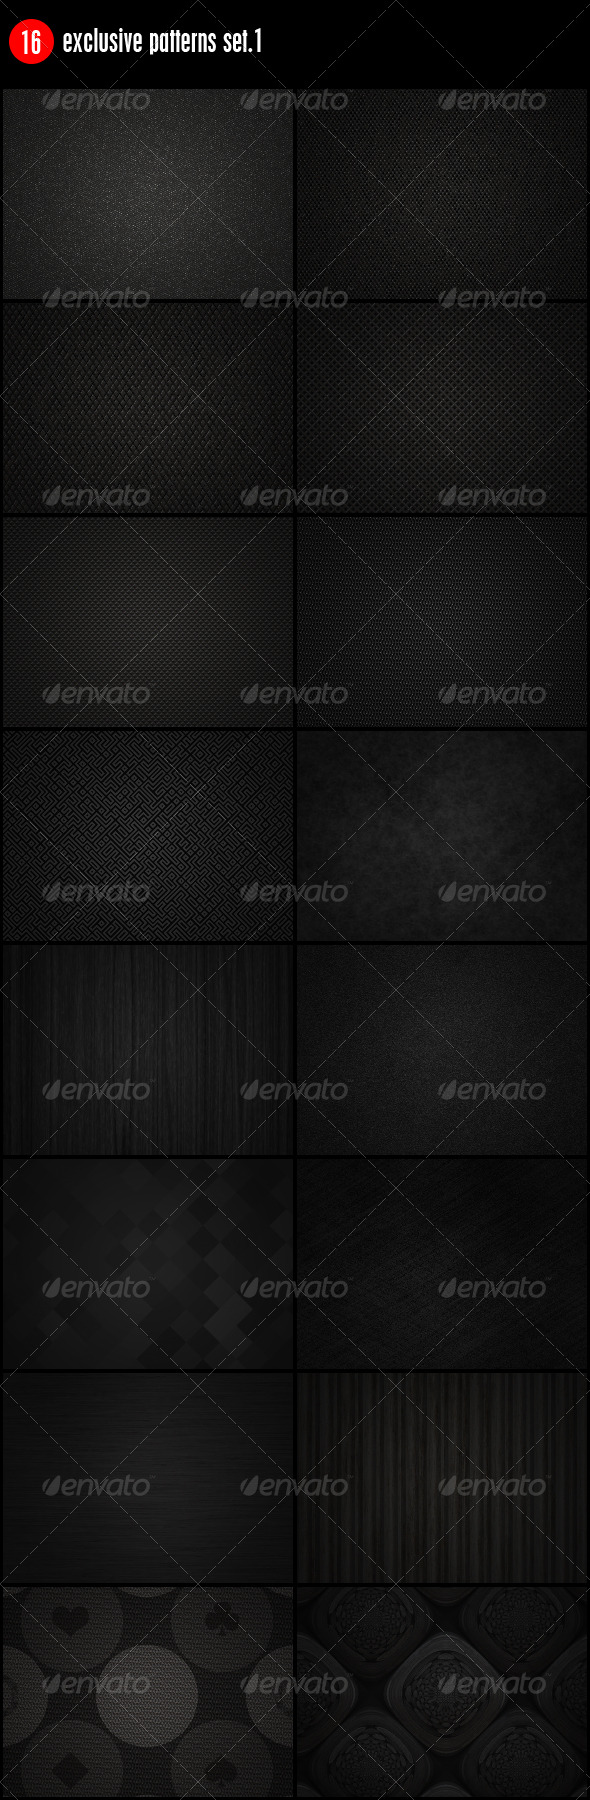 GraphicRiver 16 Exclusive Patterns Set.1 144437